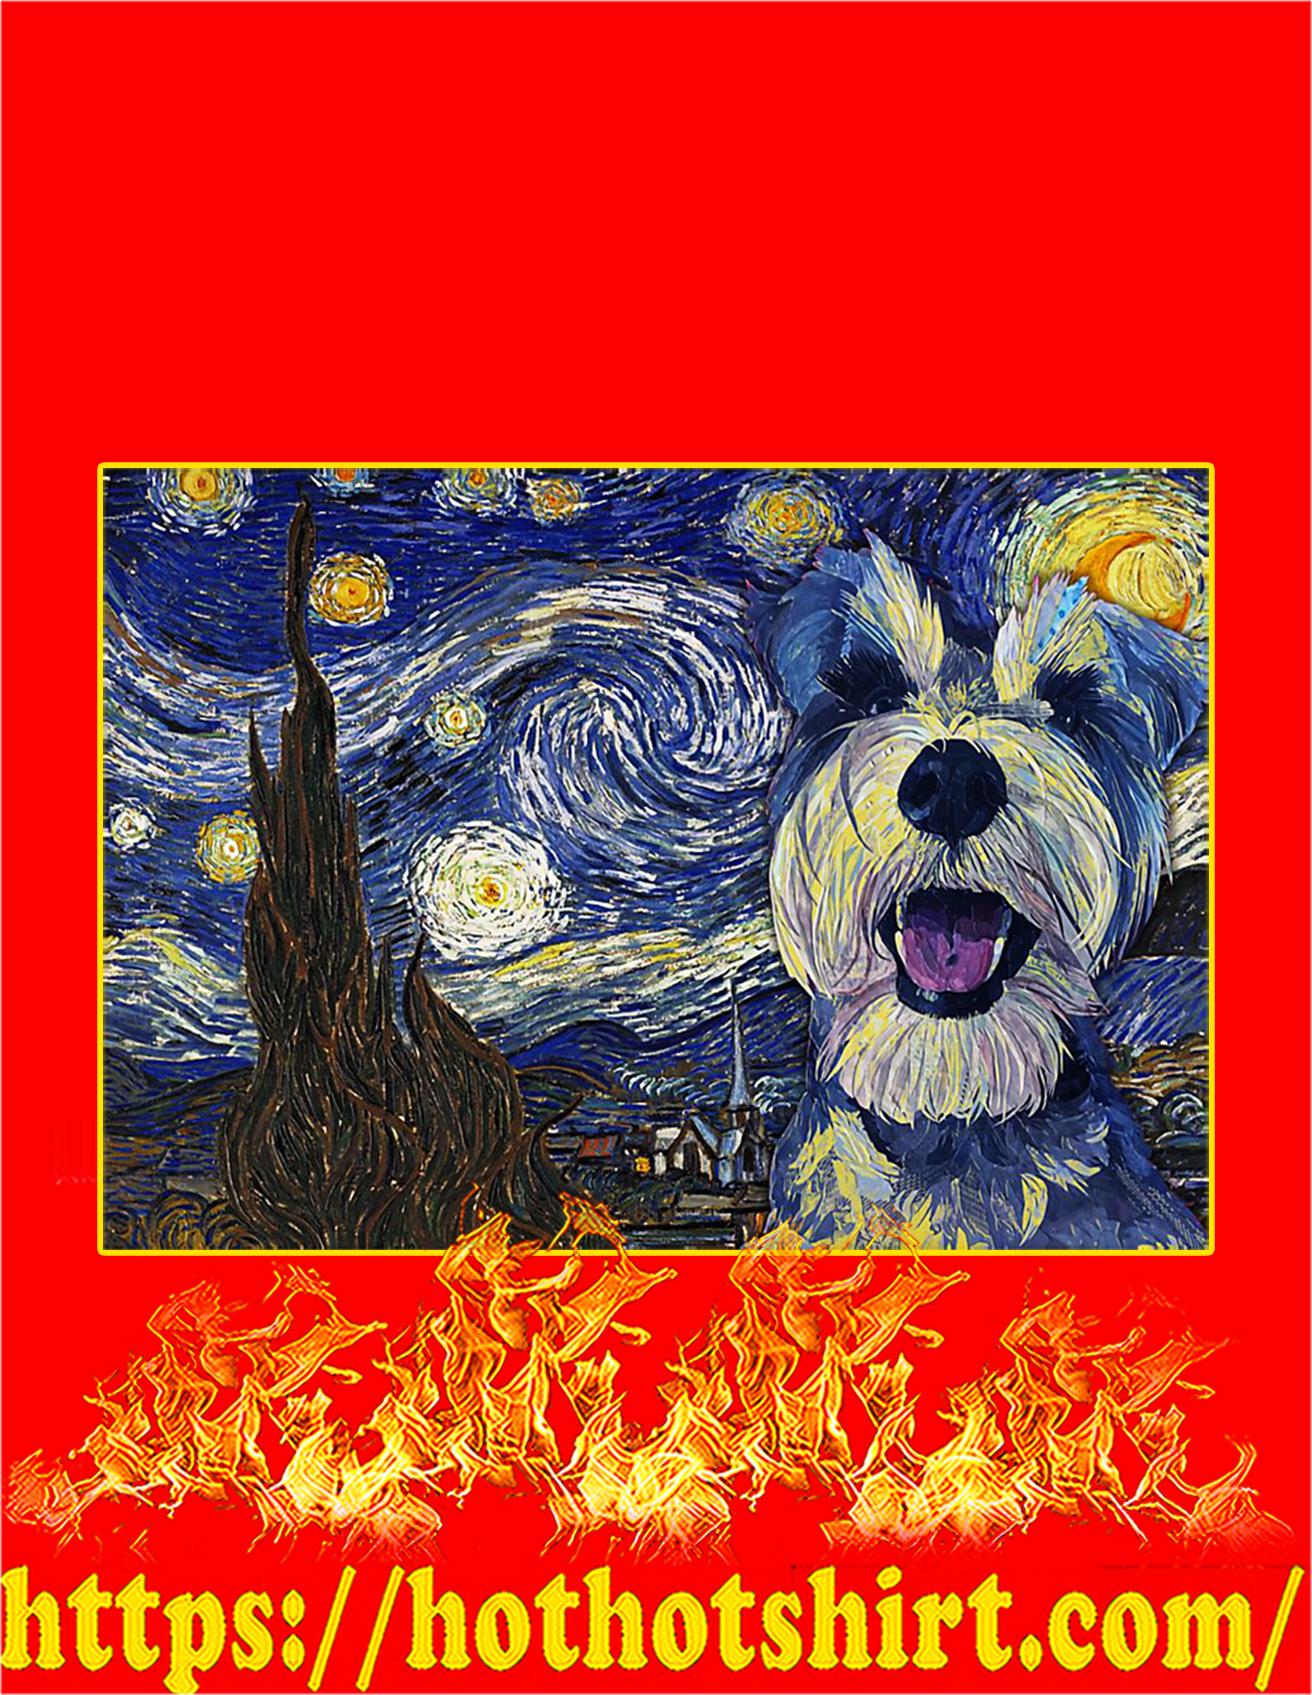 Schnauzer dog van gogh poster - A2